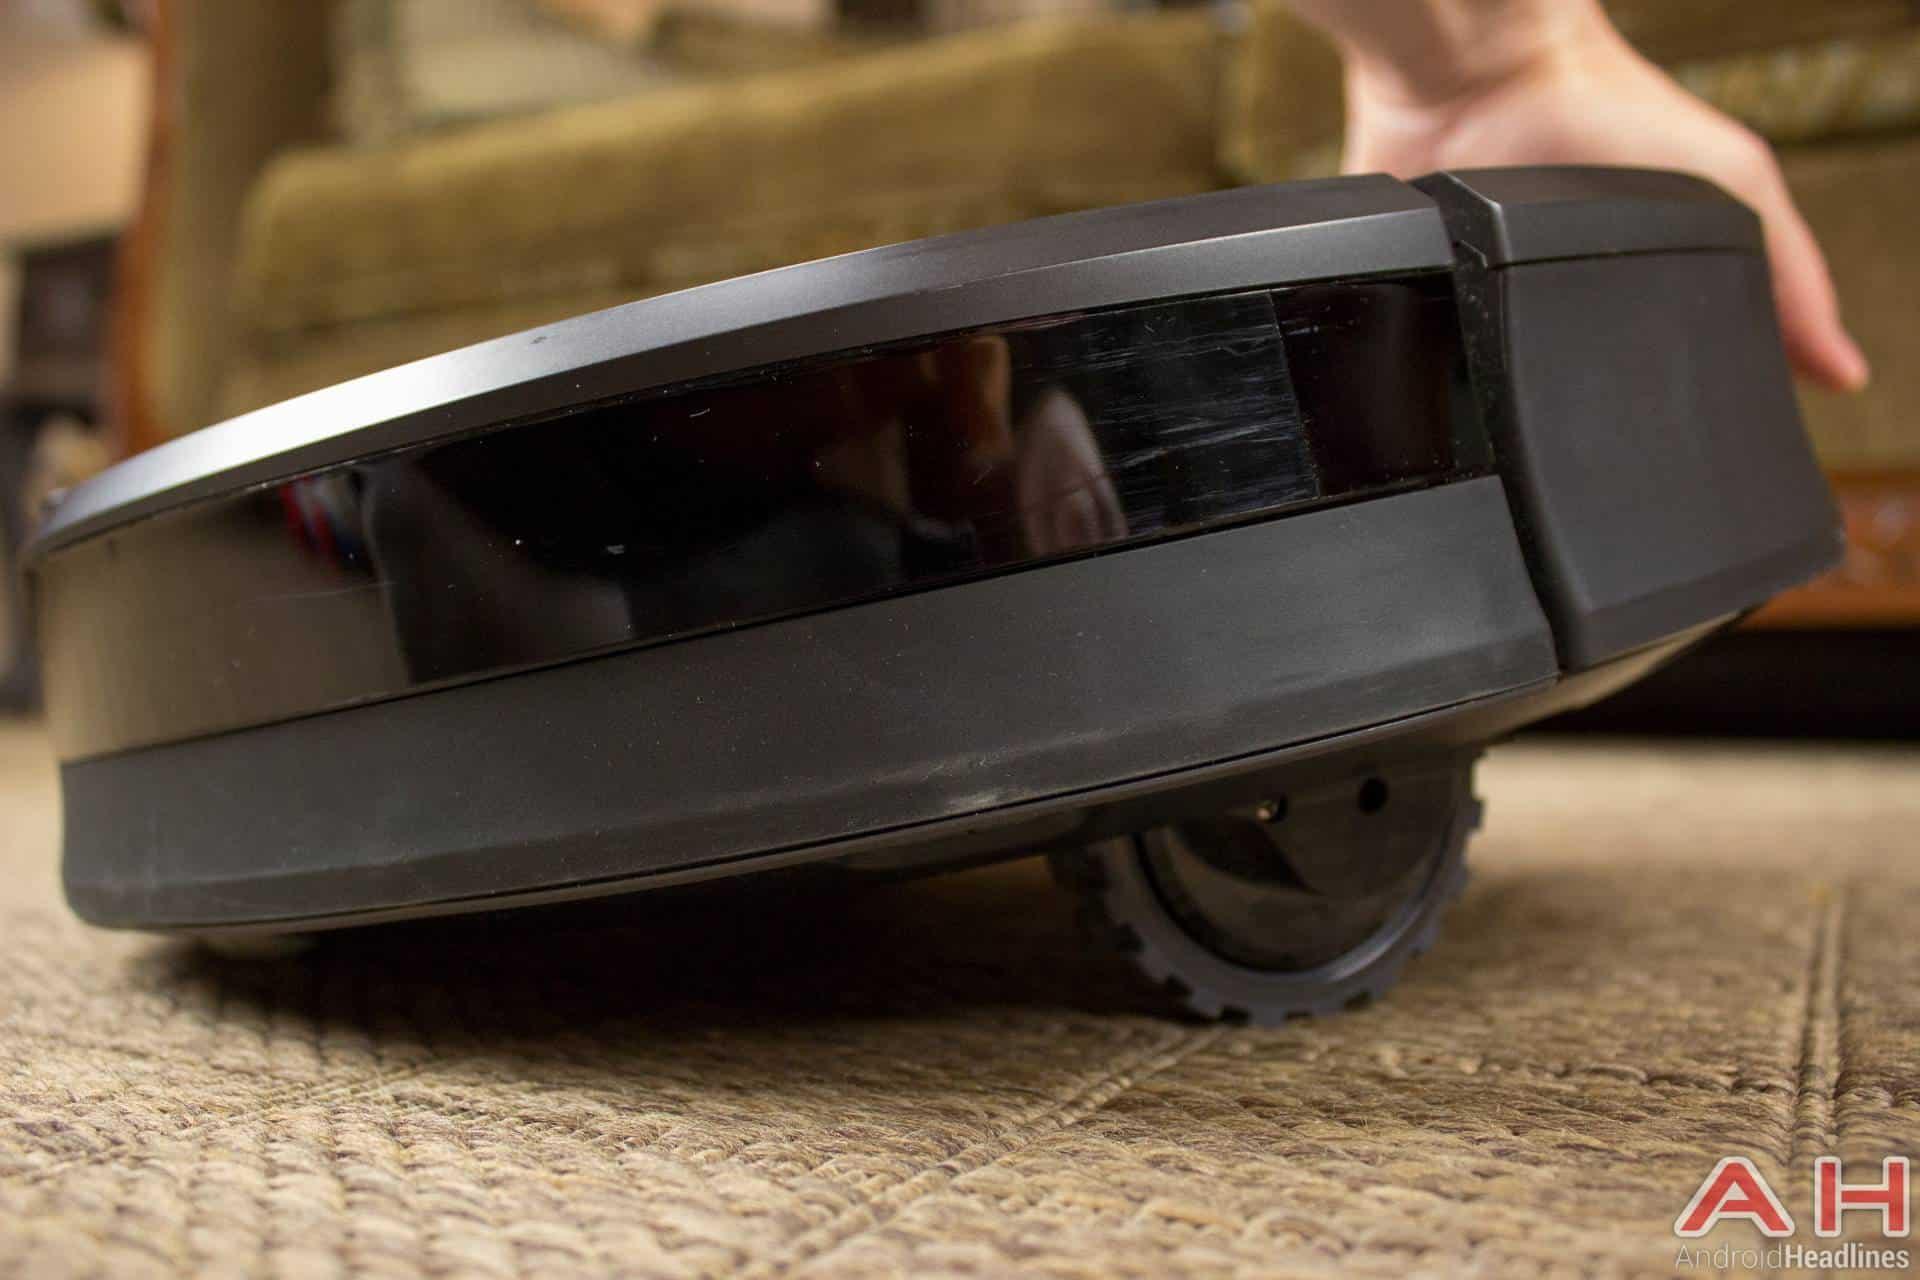 iRobot Roomba 980 AH NS wheels up